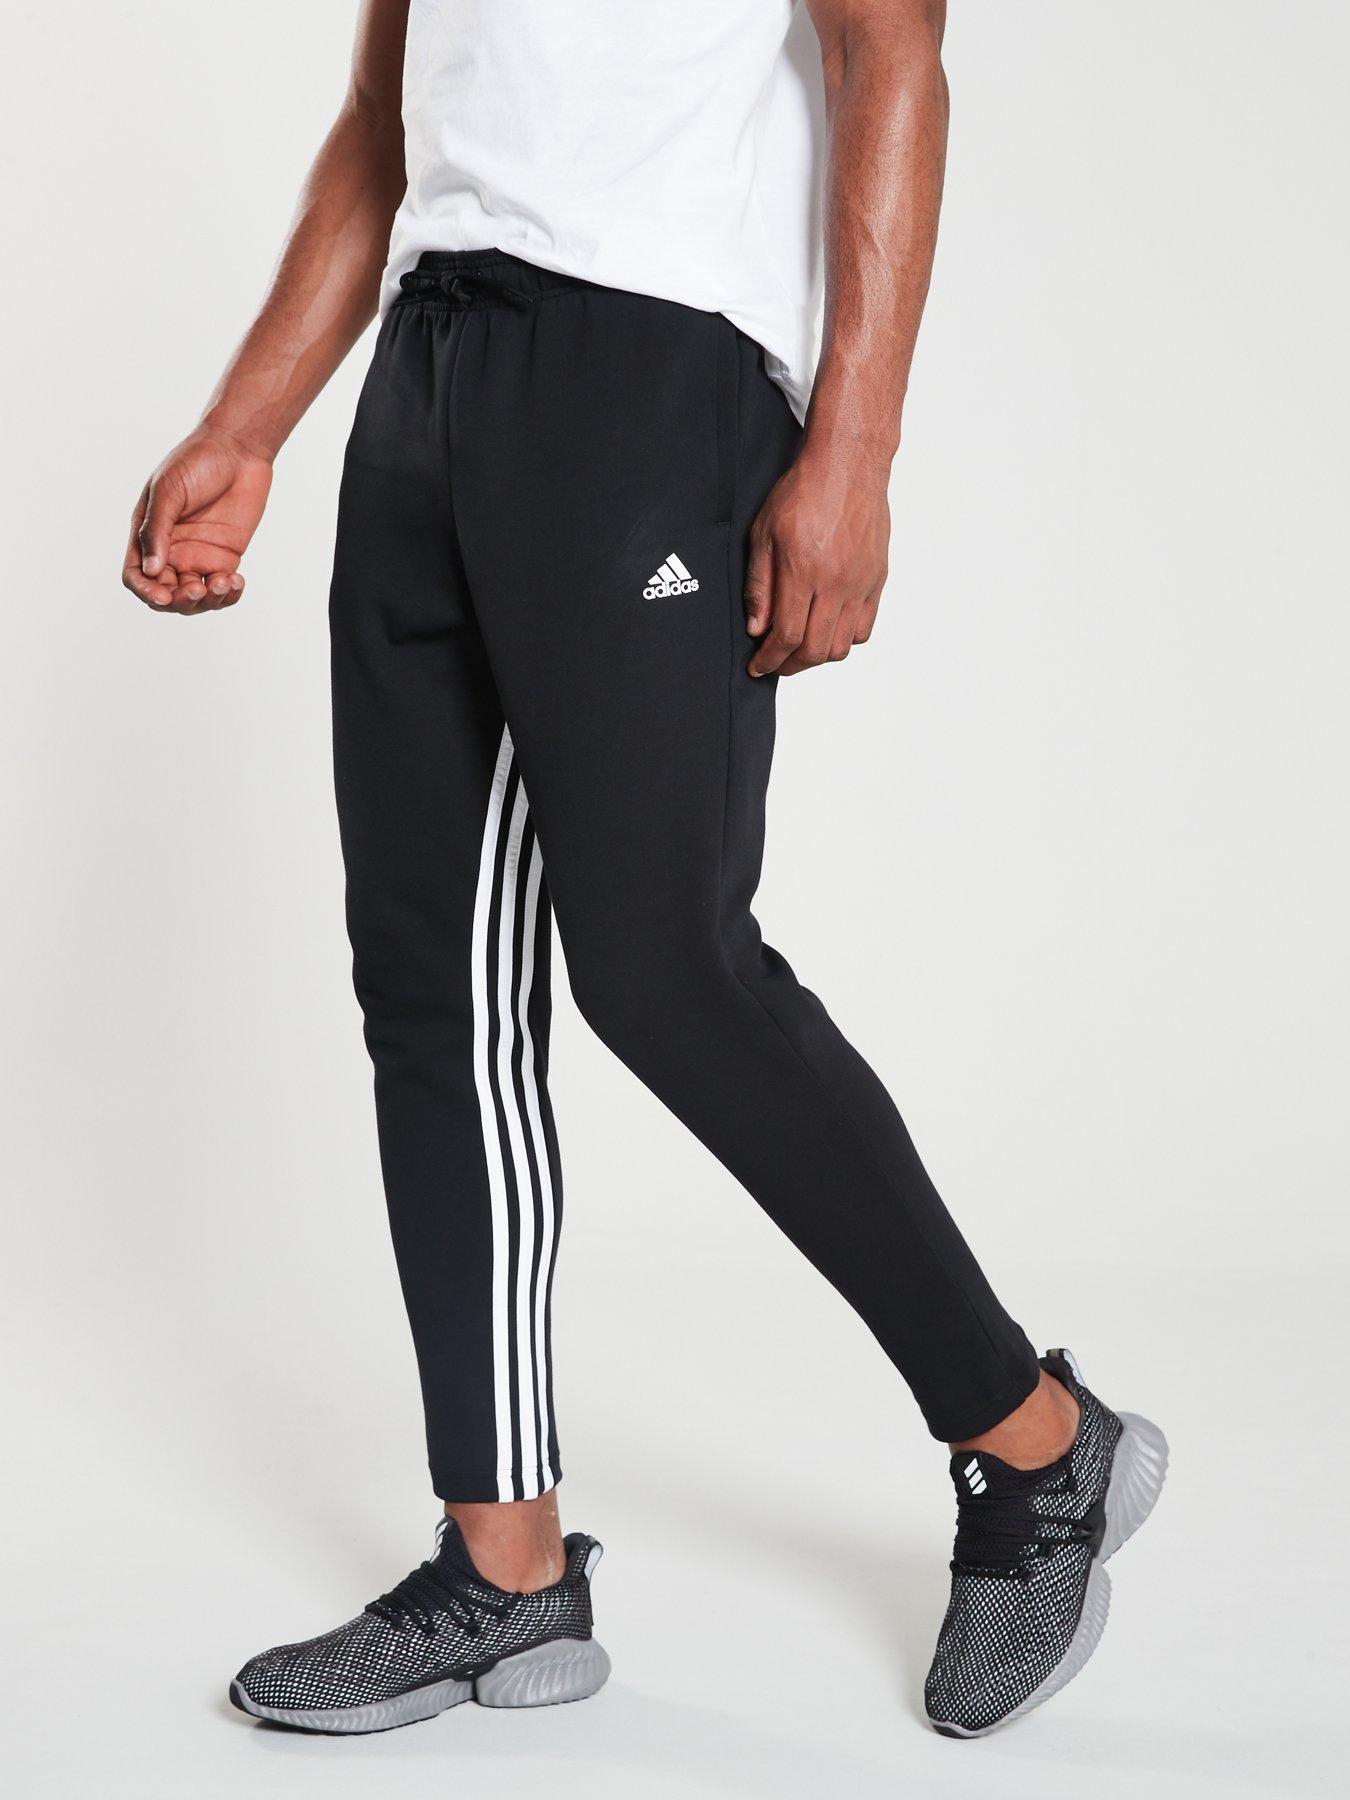 Tracksuit BottomsJogging Adidas Very co uk OP8nk0wXZN